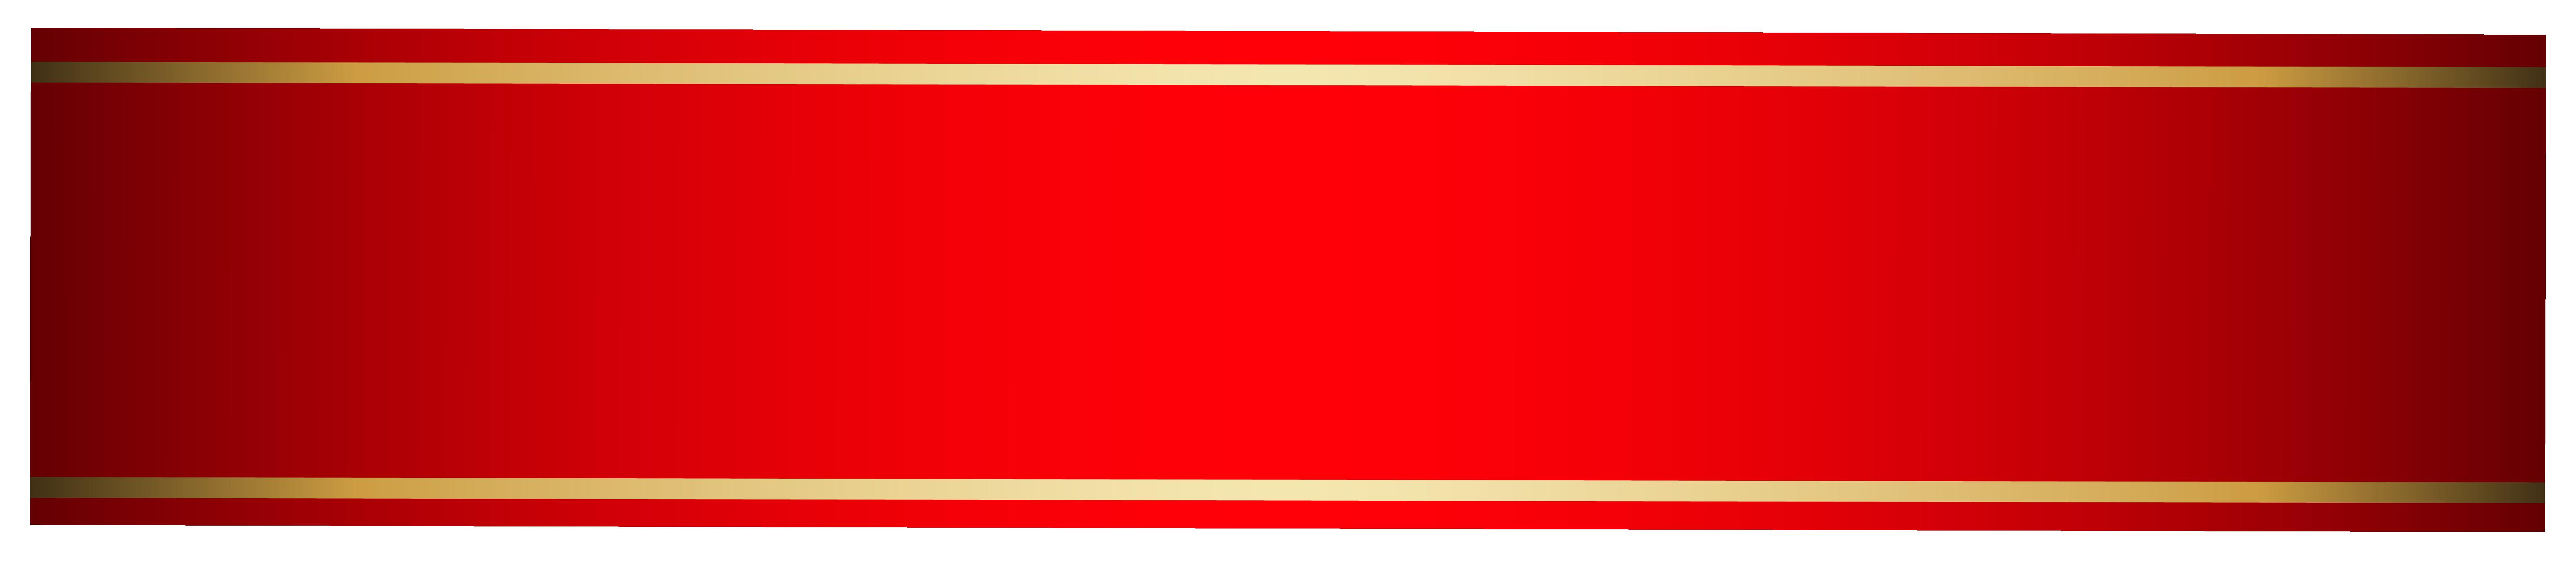 Ribbon Decor Png Clipart Image Clip Art Clipart Images Free Clip Art